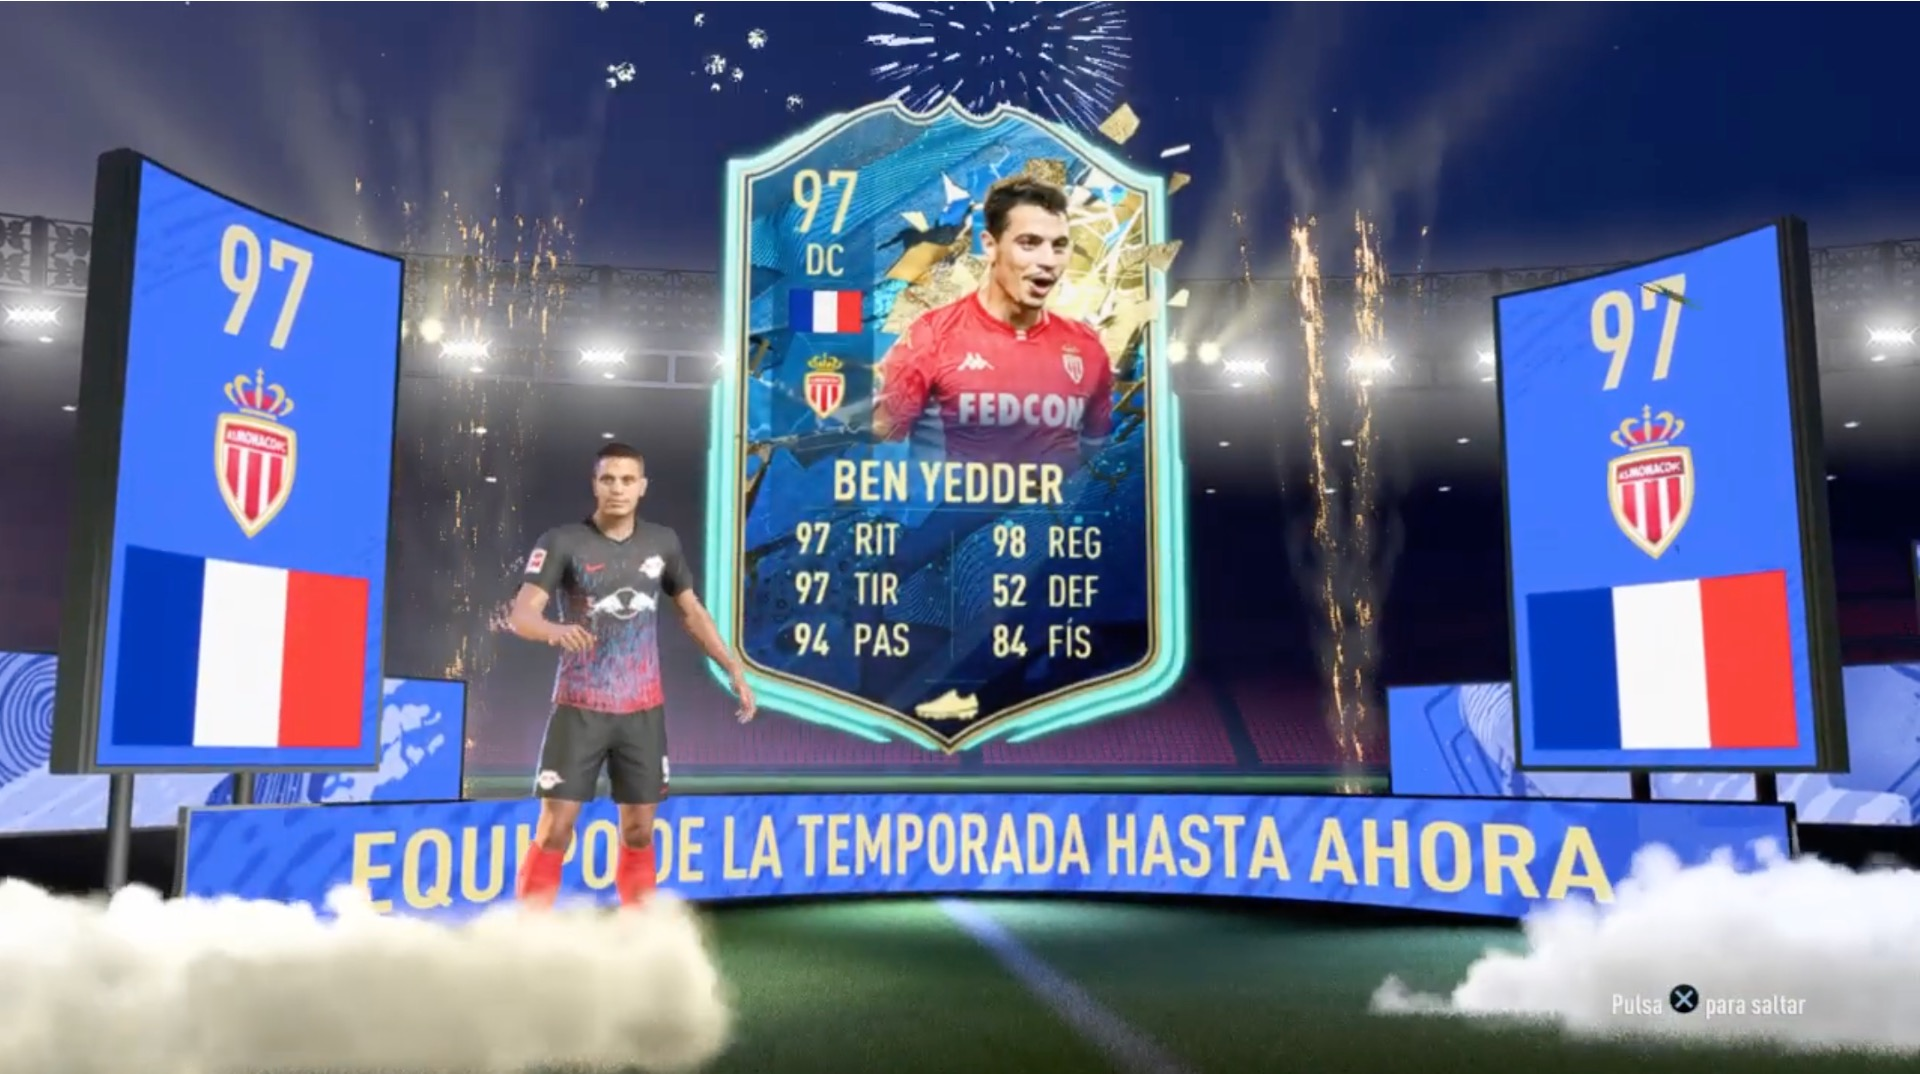 Ben Yedder TOTSSF in FIFA 20